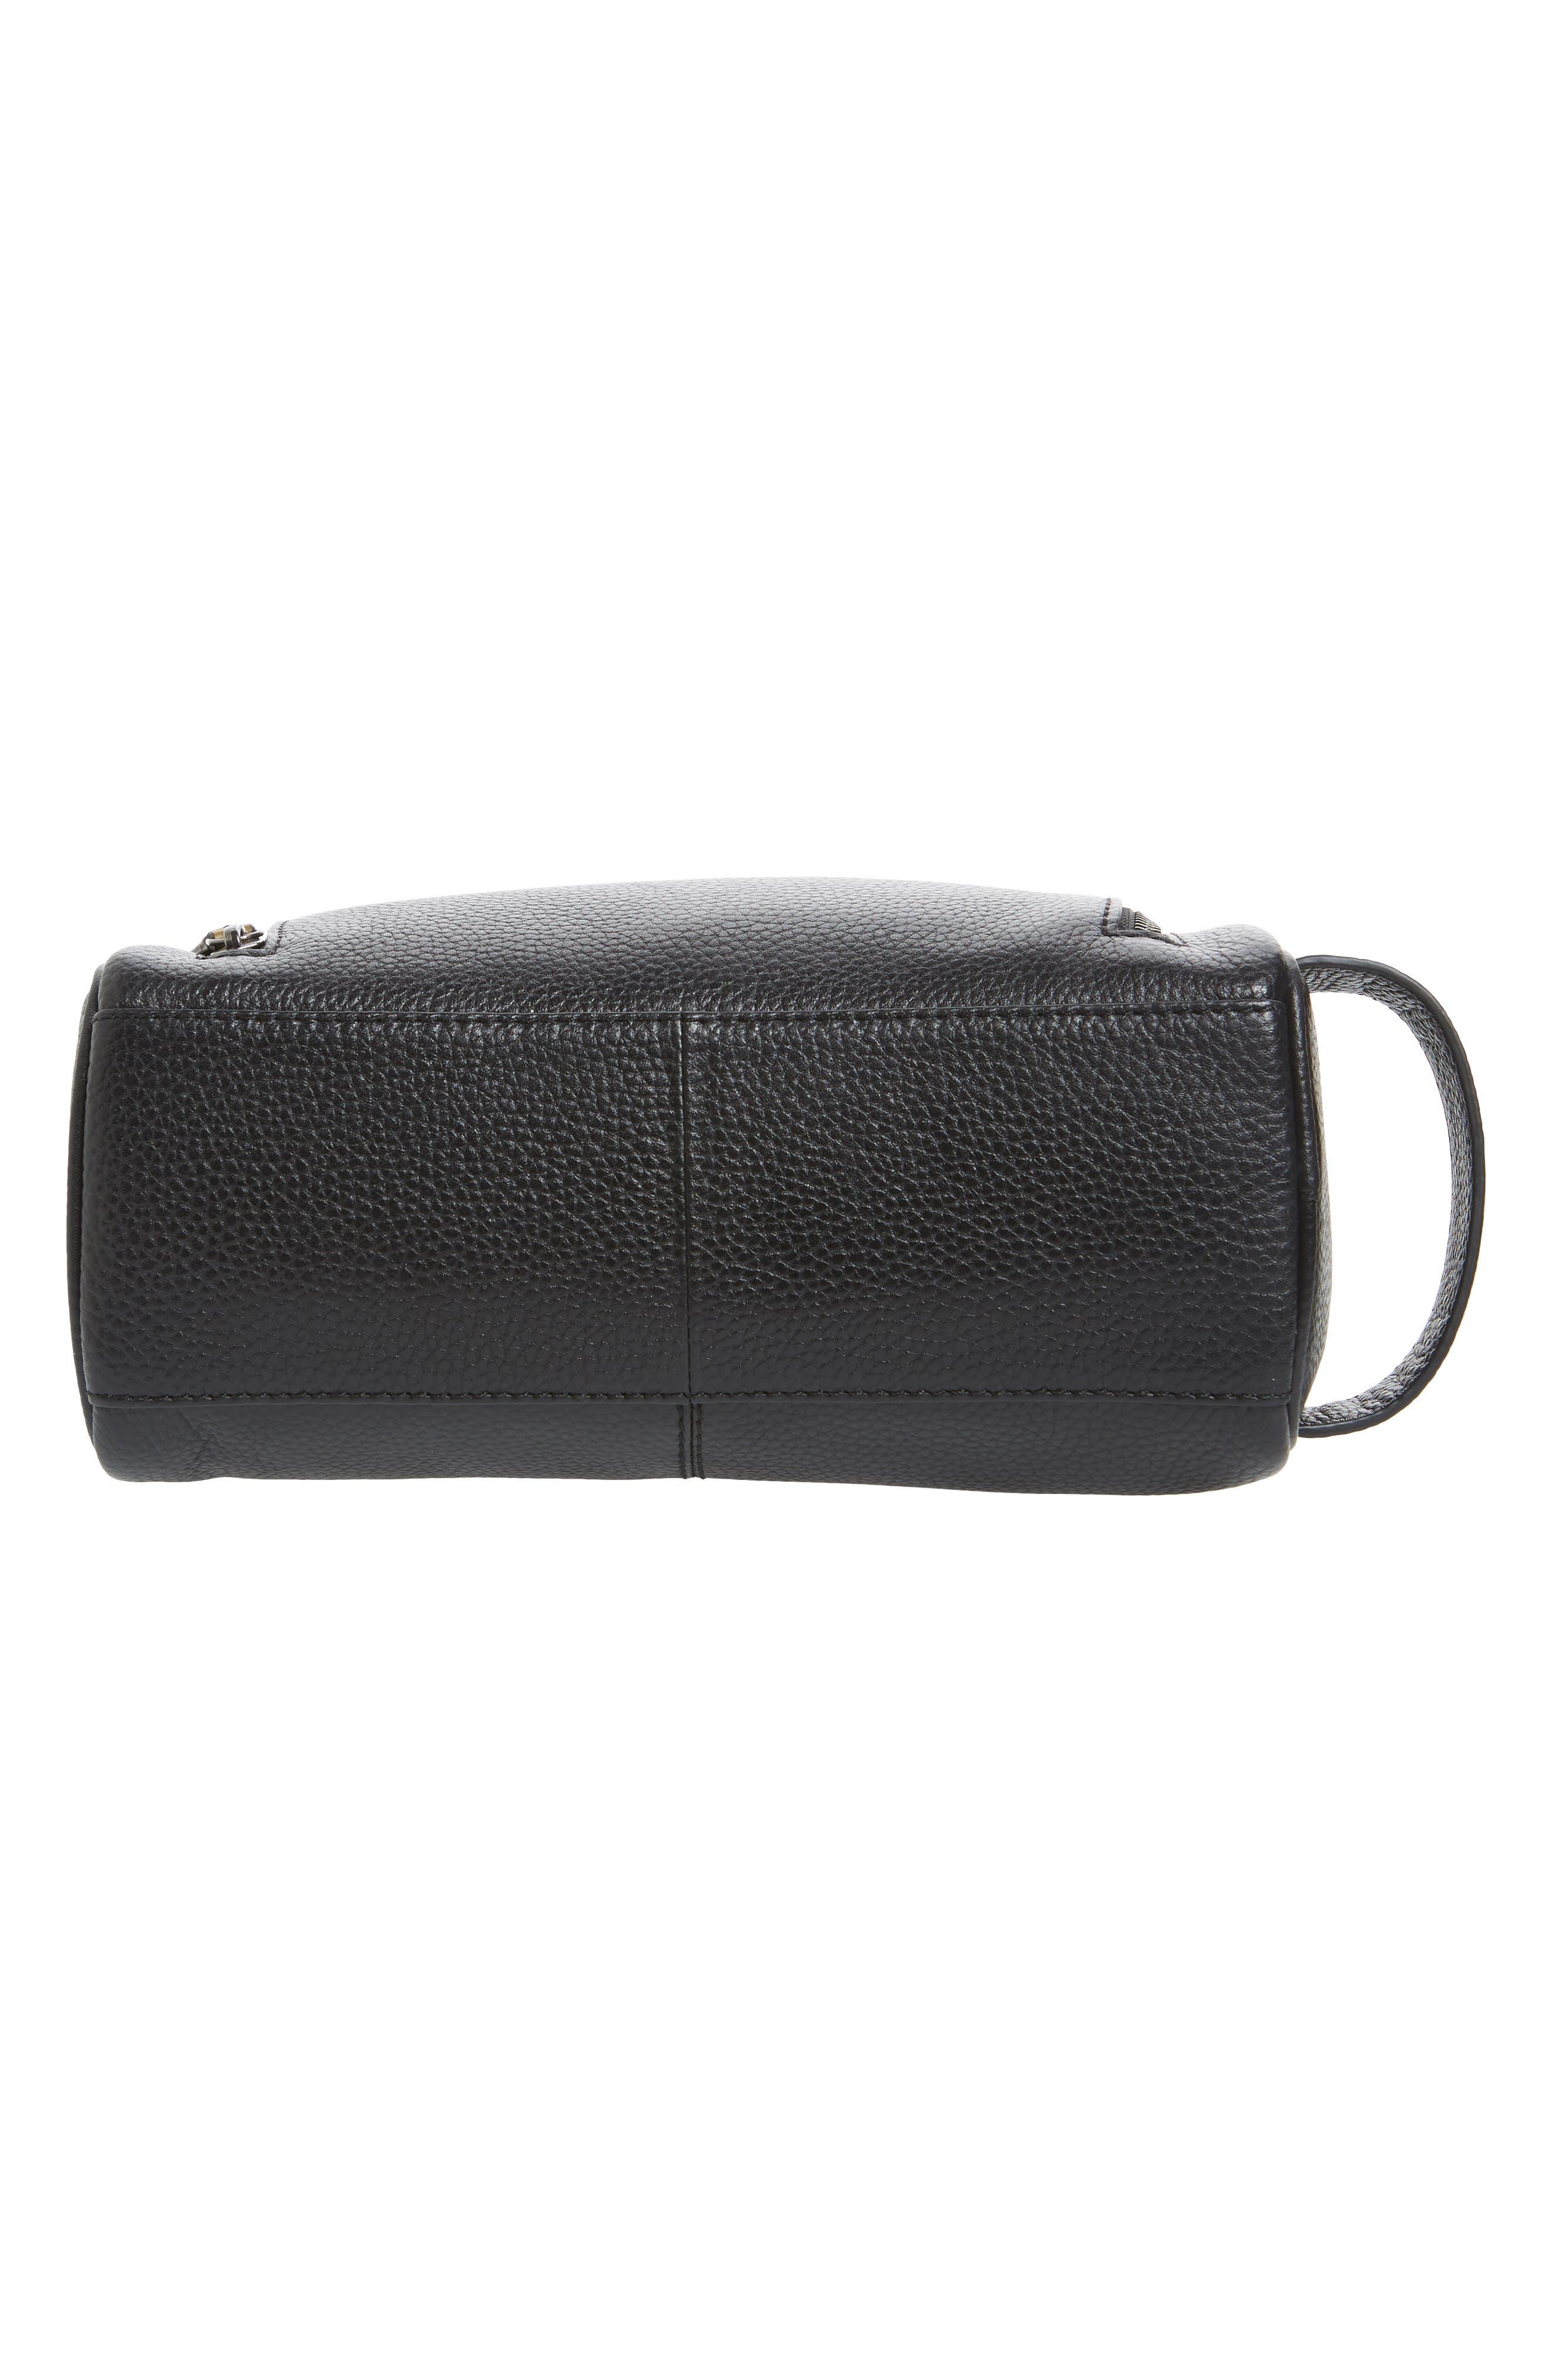 Soaps Leather Dopp Kit,                             Alternate thumbnail 5, color,                             BLACK